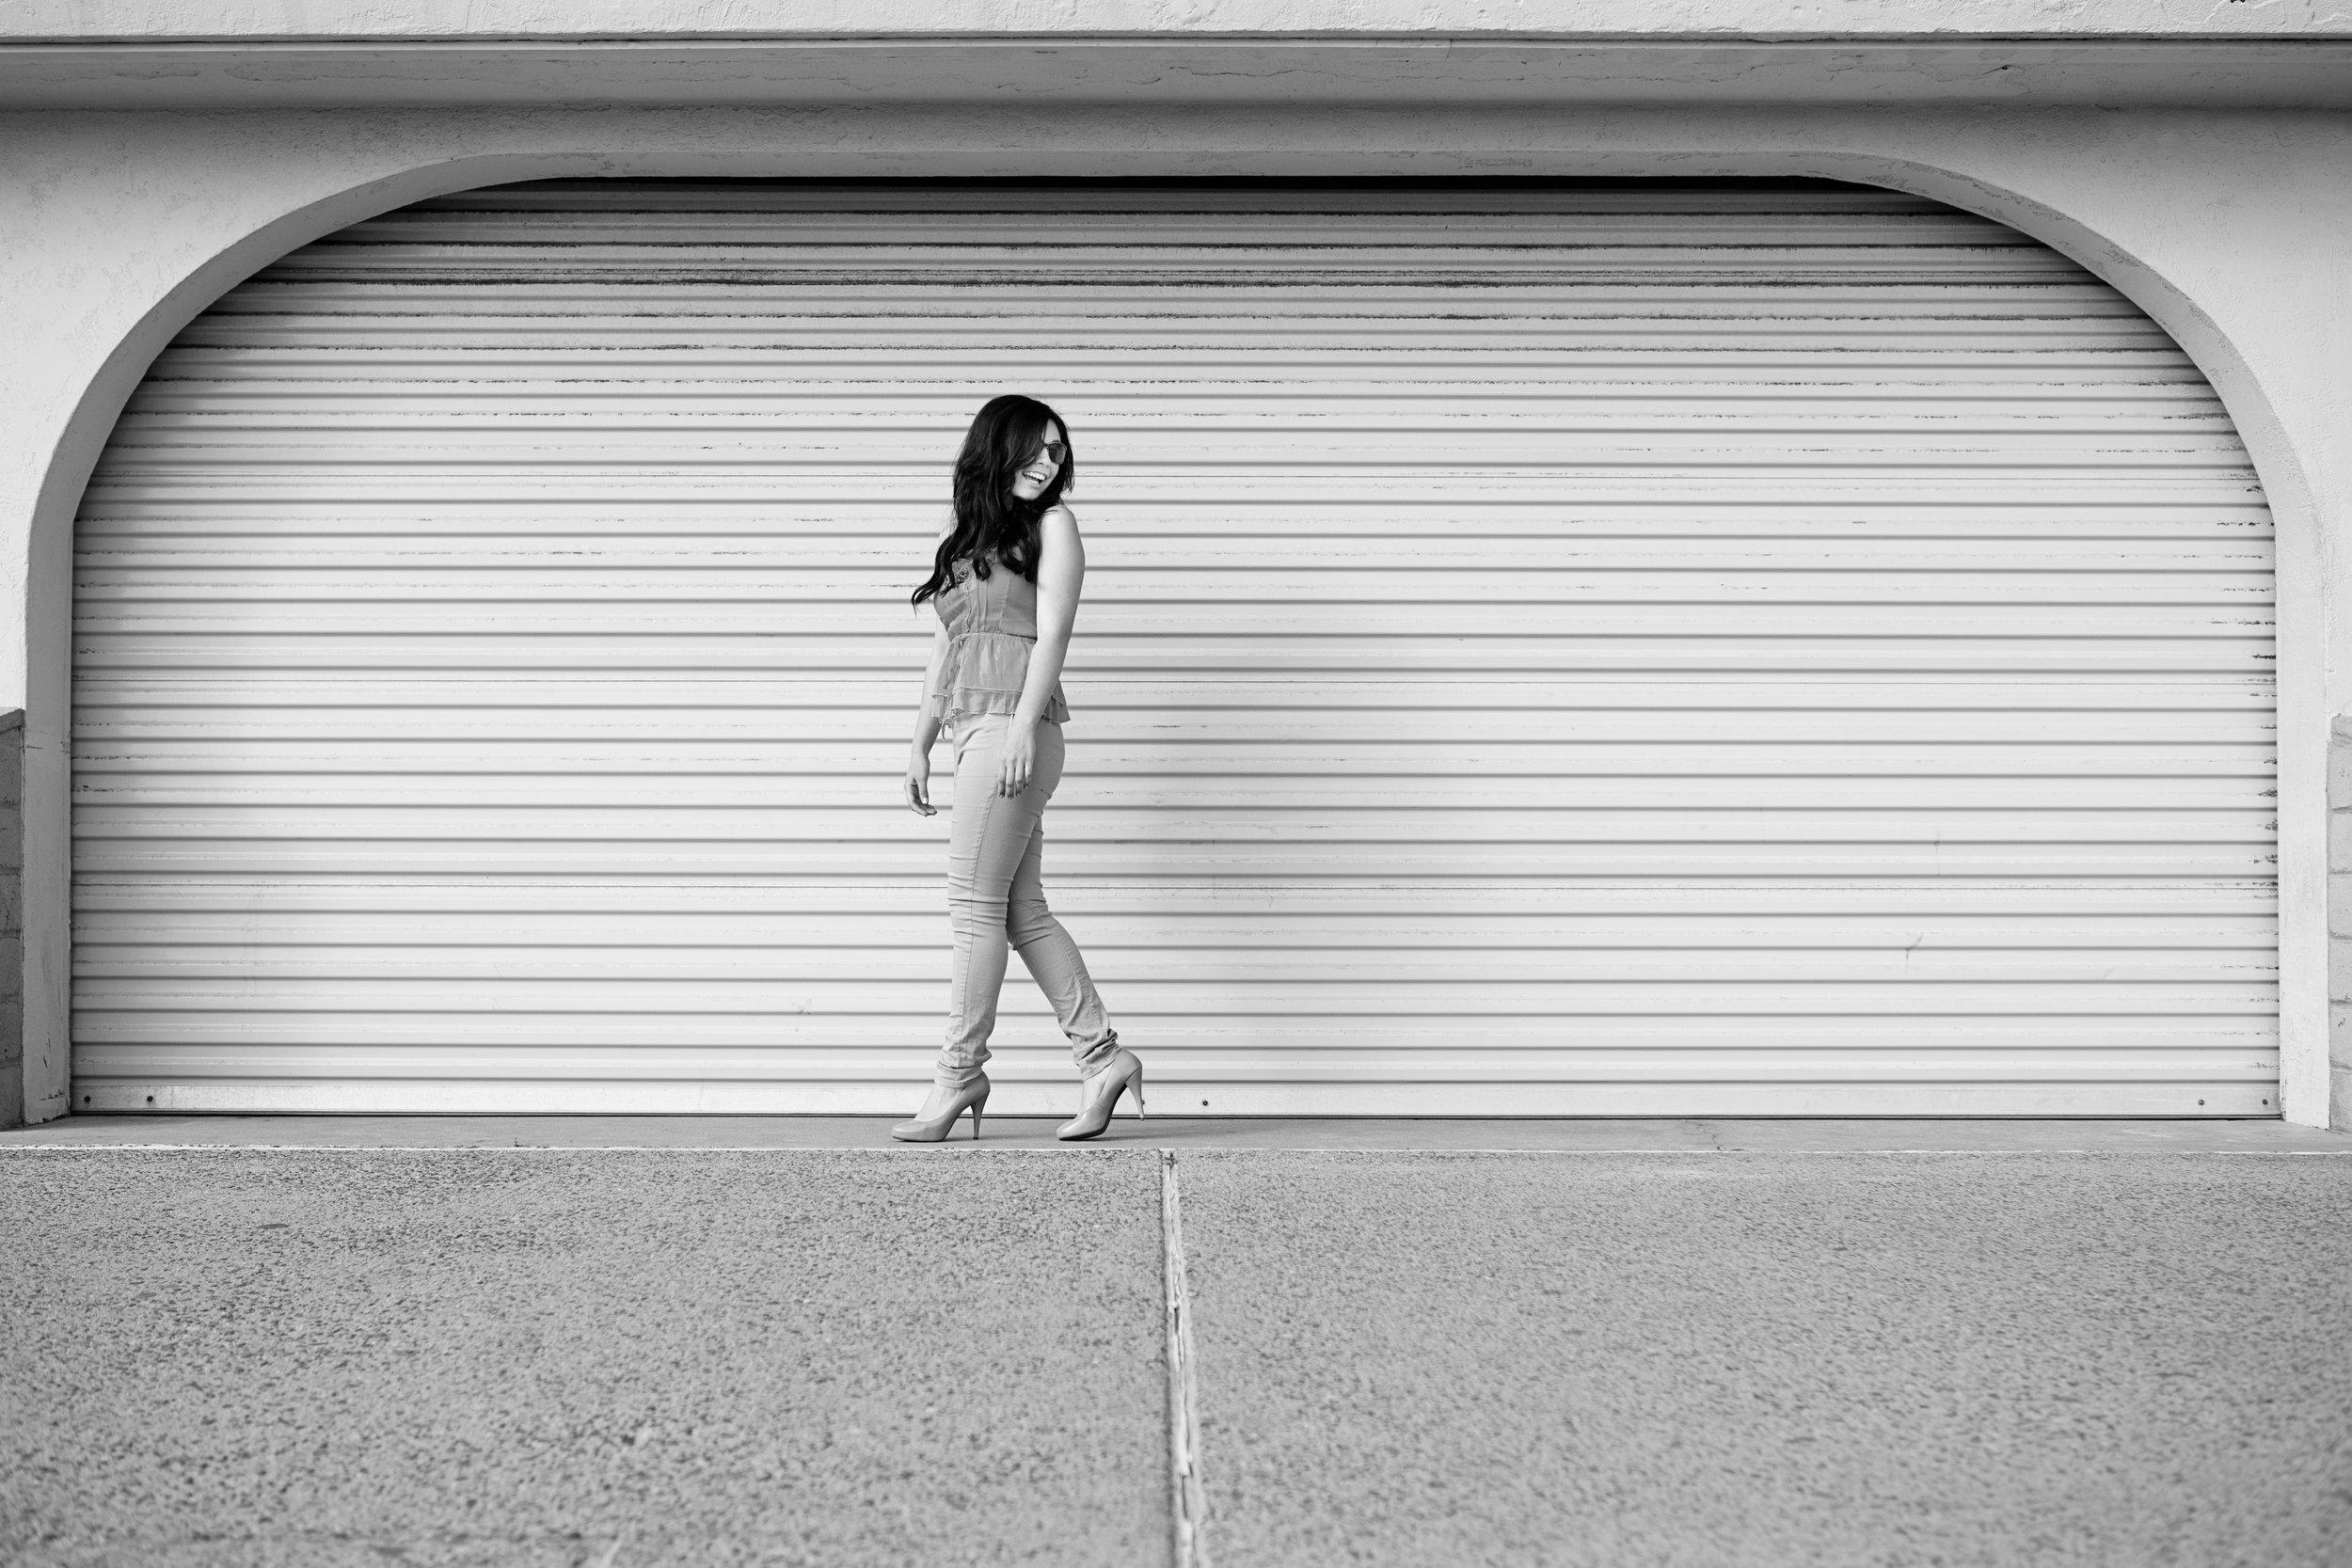 Virnez_Photography_GradYQ25.jpg